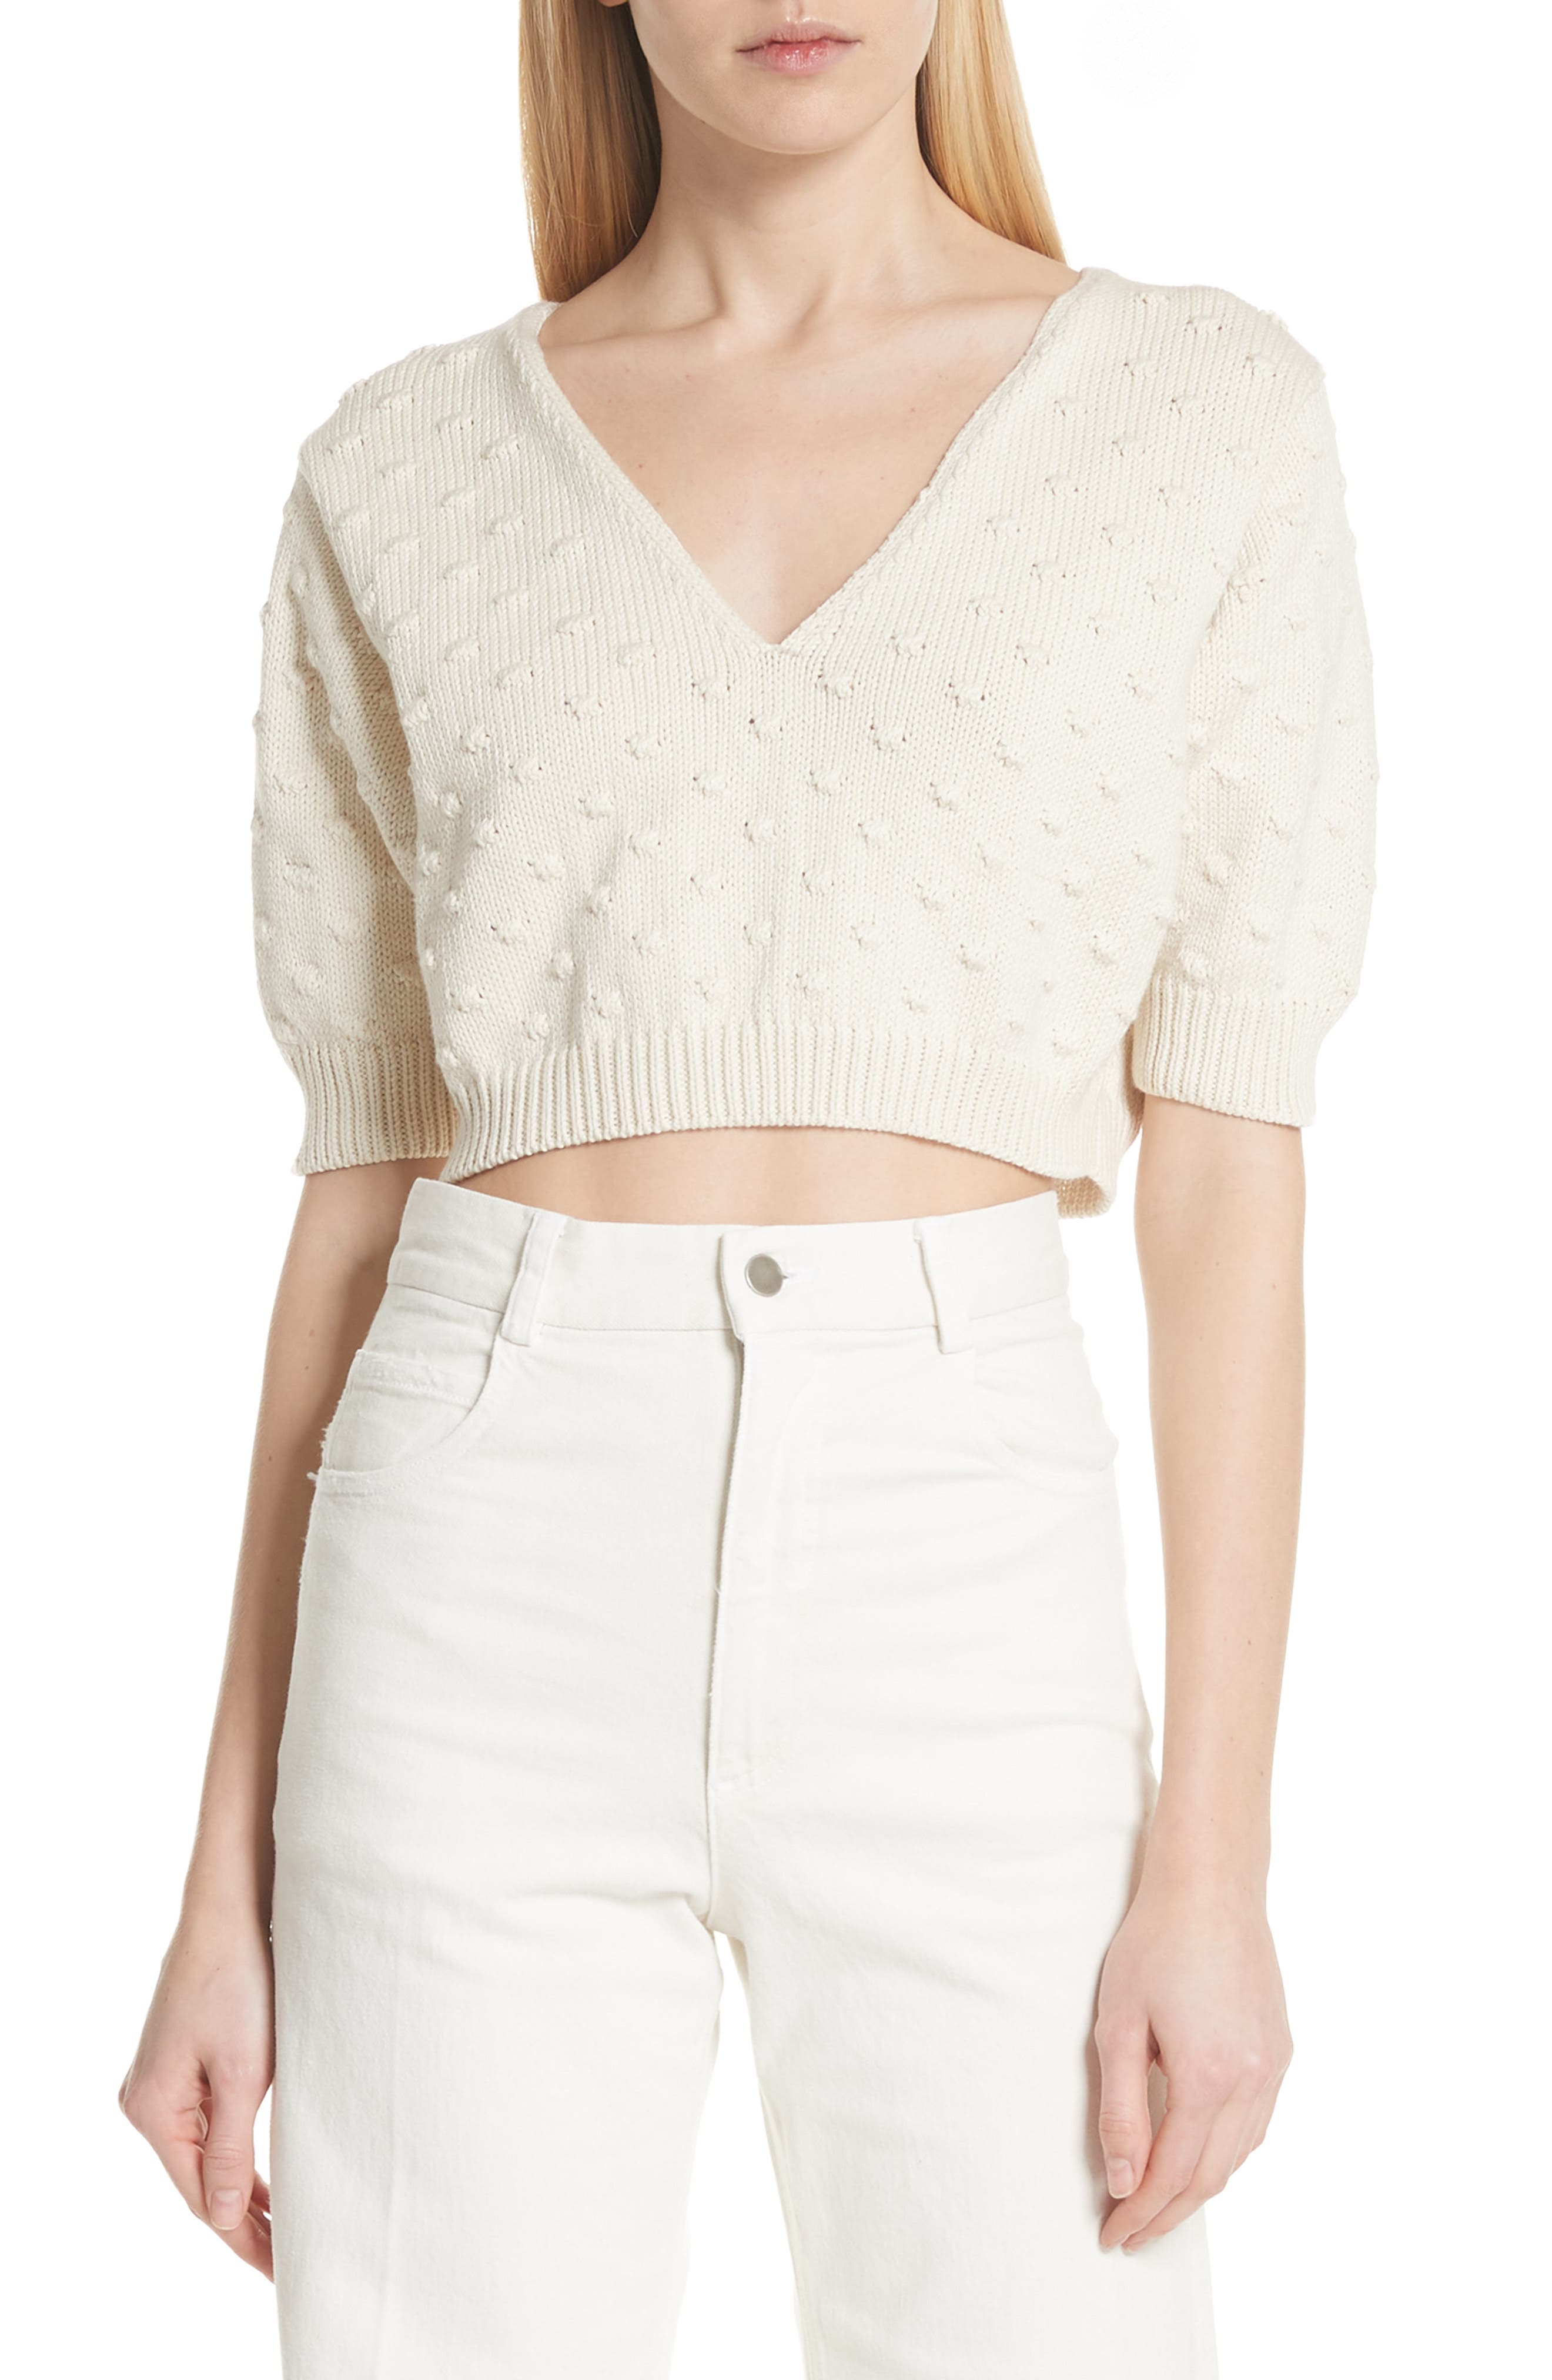 Rachel Comey Ode Garbanzo Knit Crop Sweater